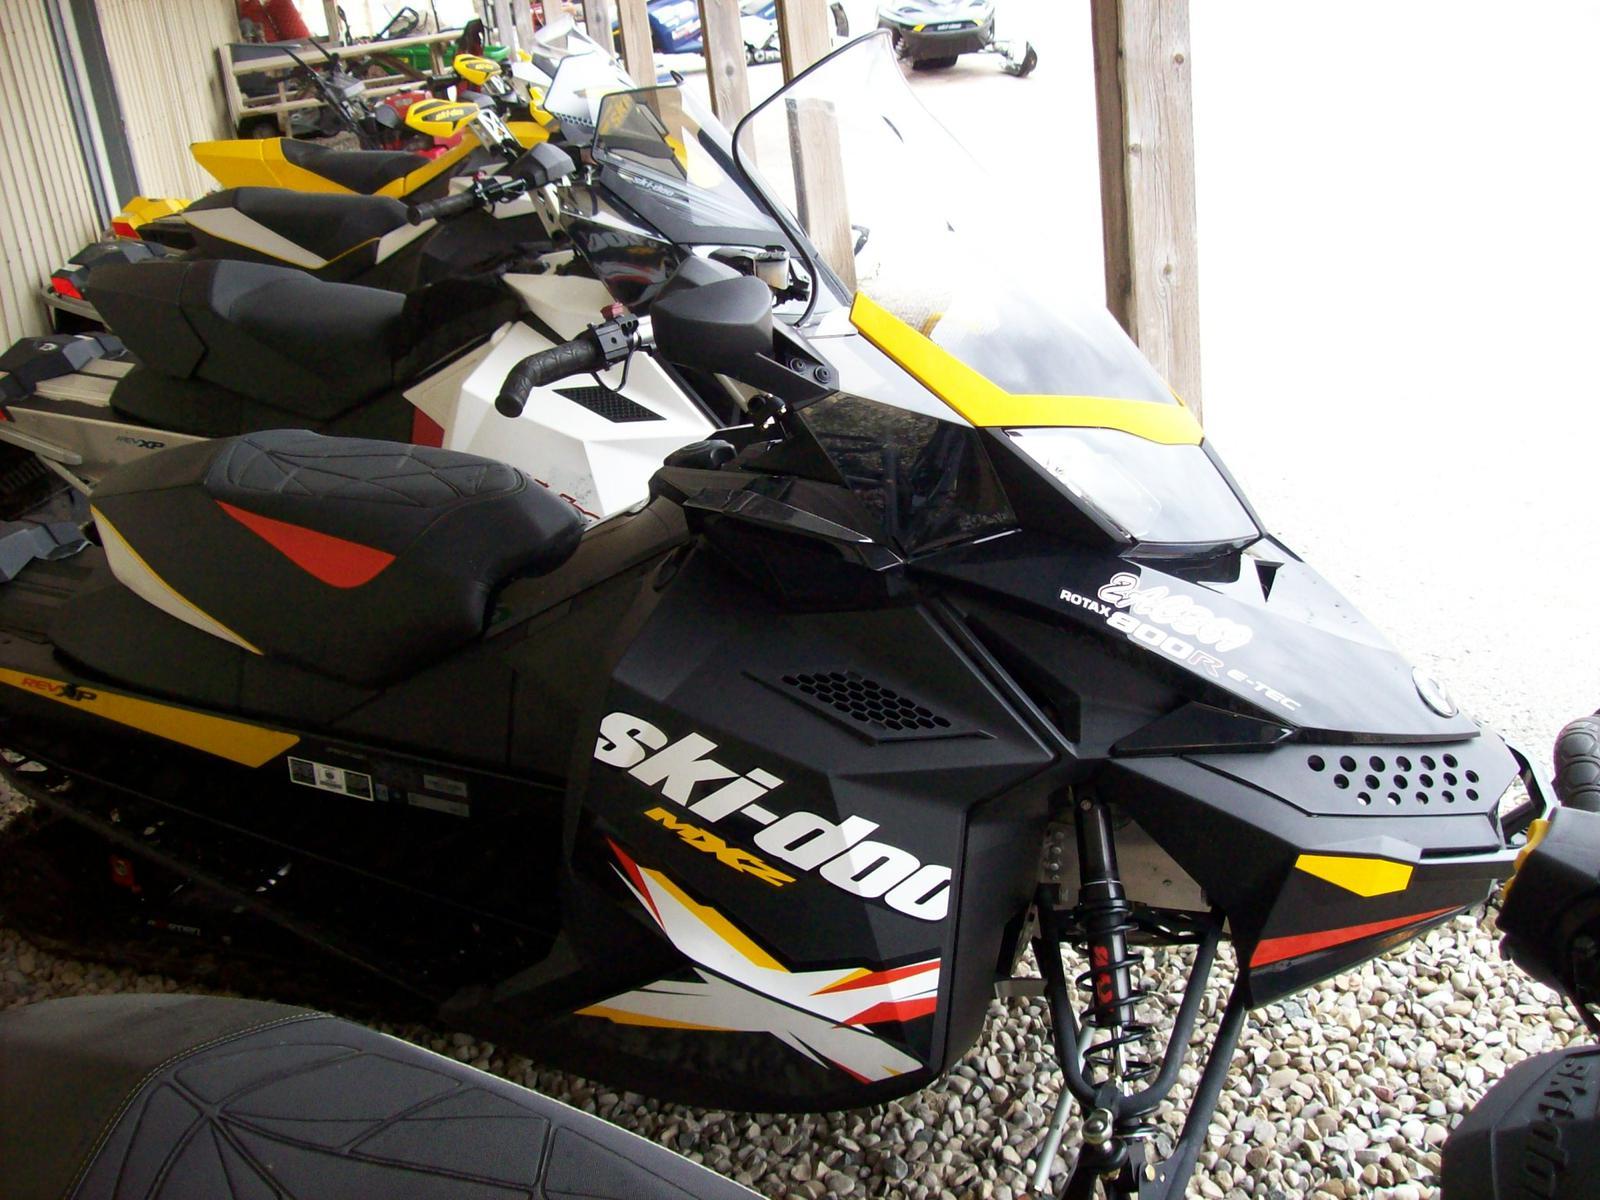 2012 Ski Doo Mx Z X Rotax E Tec 800r For Sale In Wingham On Lynn 2014 Snowmobile Headlight Wiring Diagram Stock Image Black